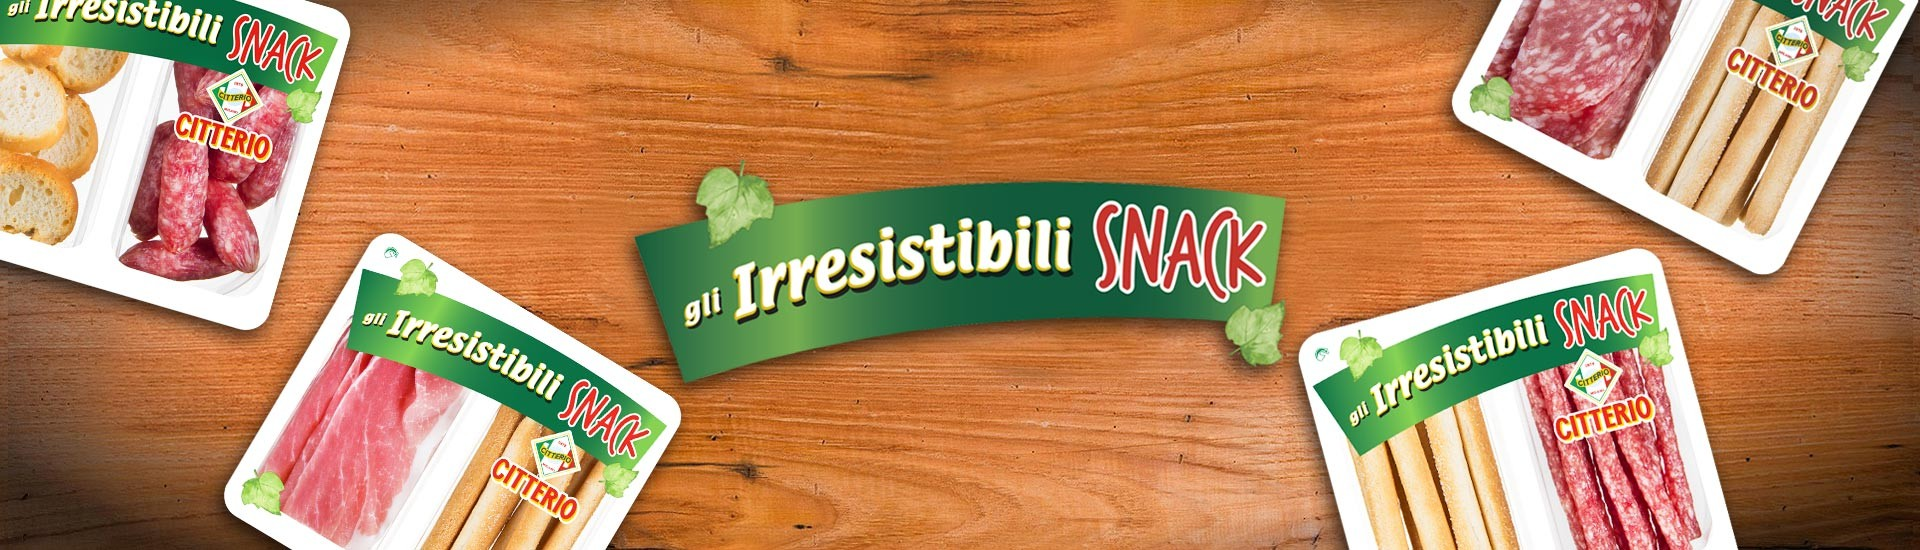 irresistibili snack